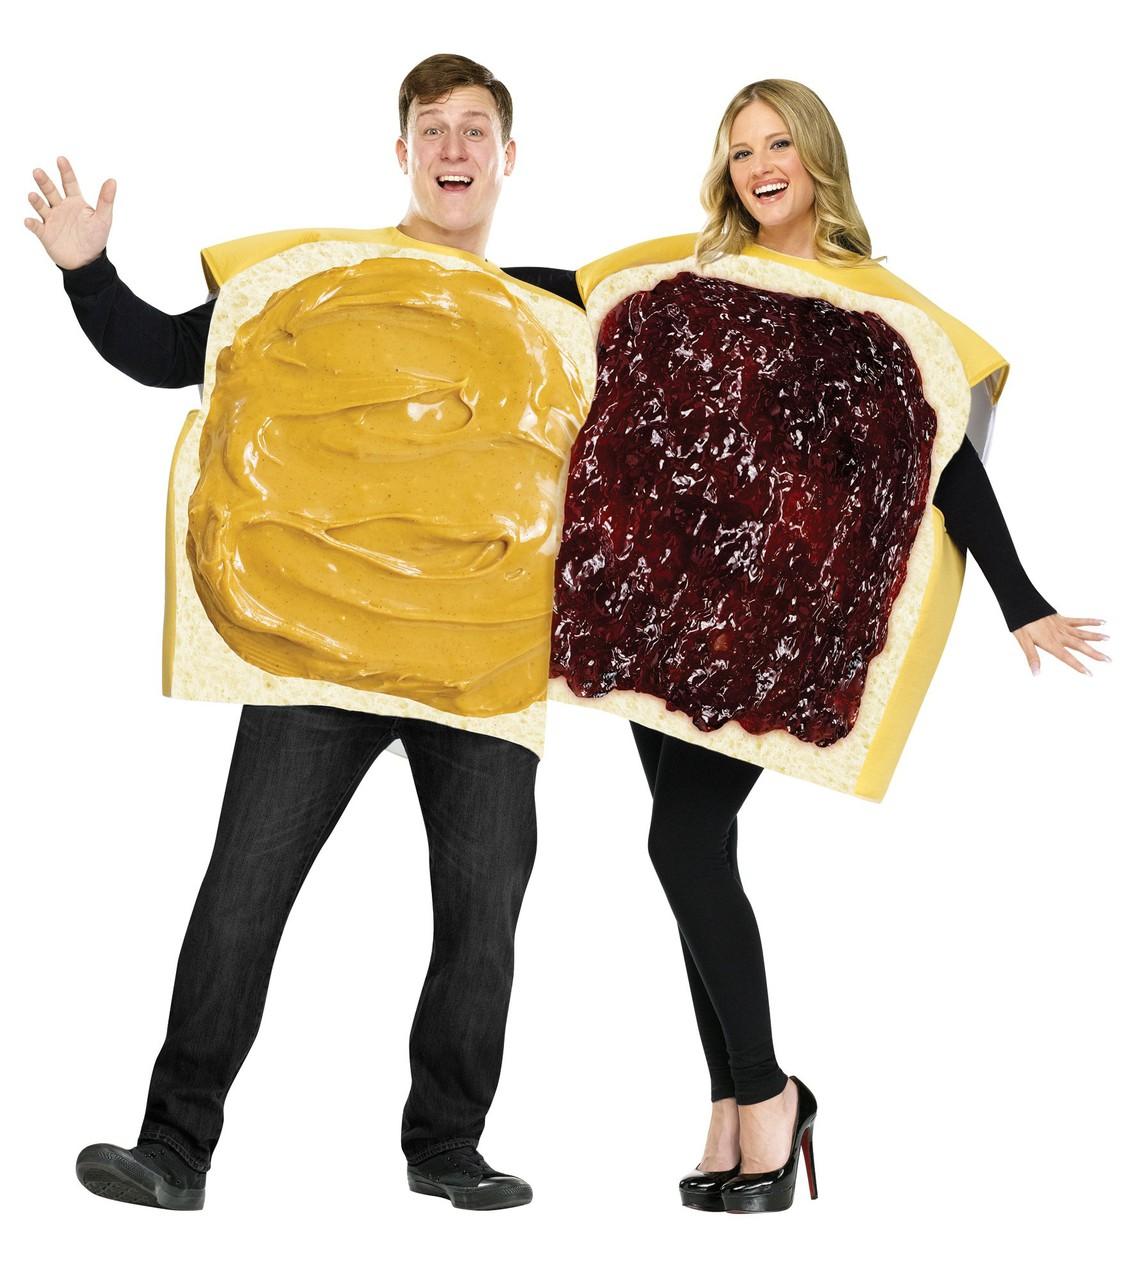 Peanut Butter u0026 Jelly Couples Halloween Costume  sc 1 st  The Costume Shoppe & Peanut Butter u0026 Jelly Couples Halloween Costume - The Costume Shoppe